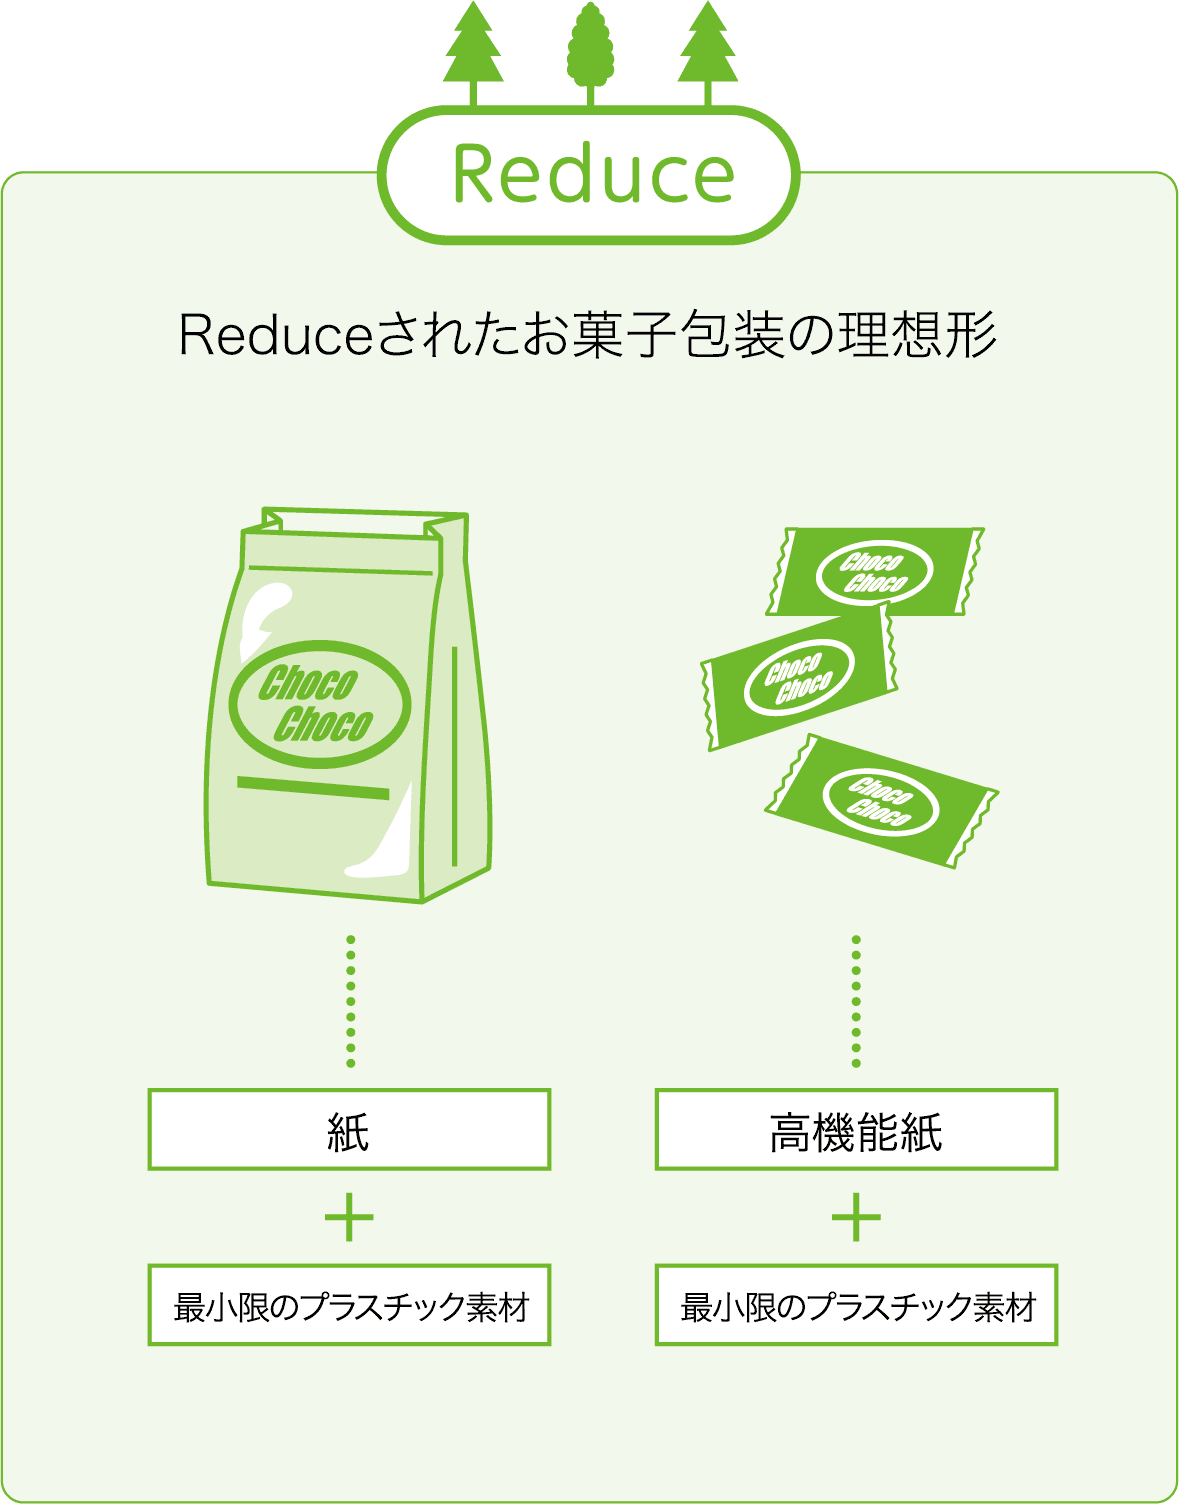 Reduce Reduce Reduceされたお菓子包装の理想形 紙 最小限のプラスチック素材 高機能紙 最小限のプラスチック素材